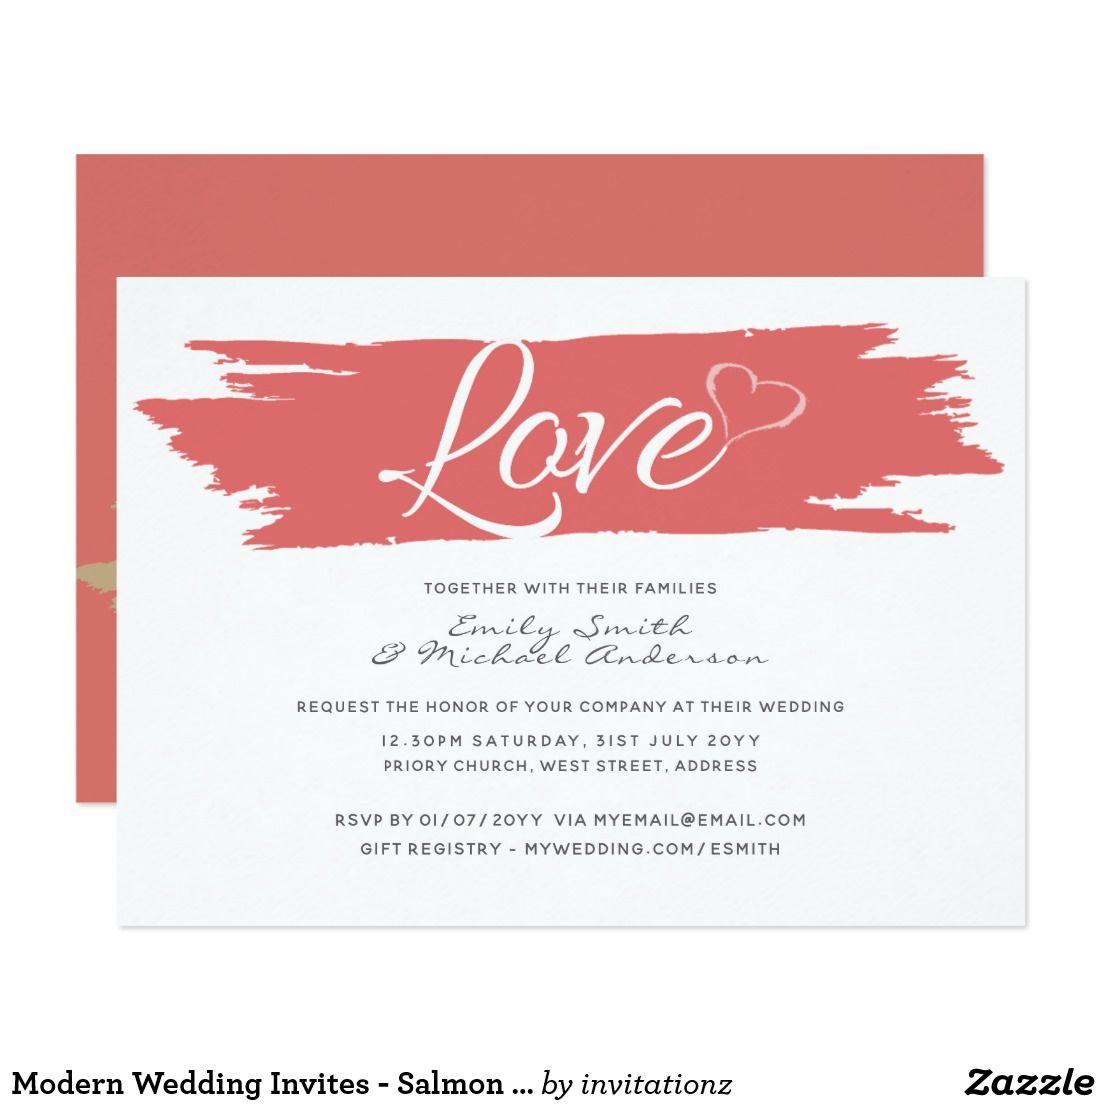 Modern Wedding Invites - Salmon Pink | Trending Wedding Themes 2018 ...